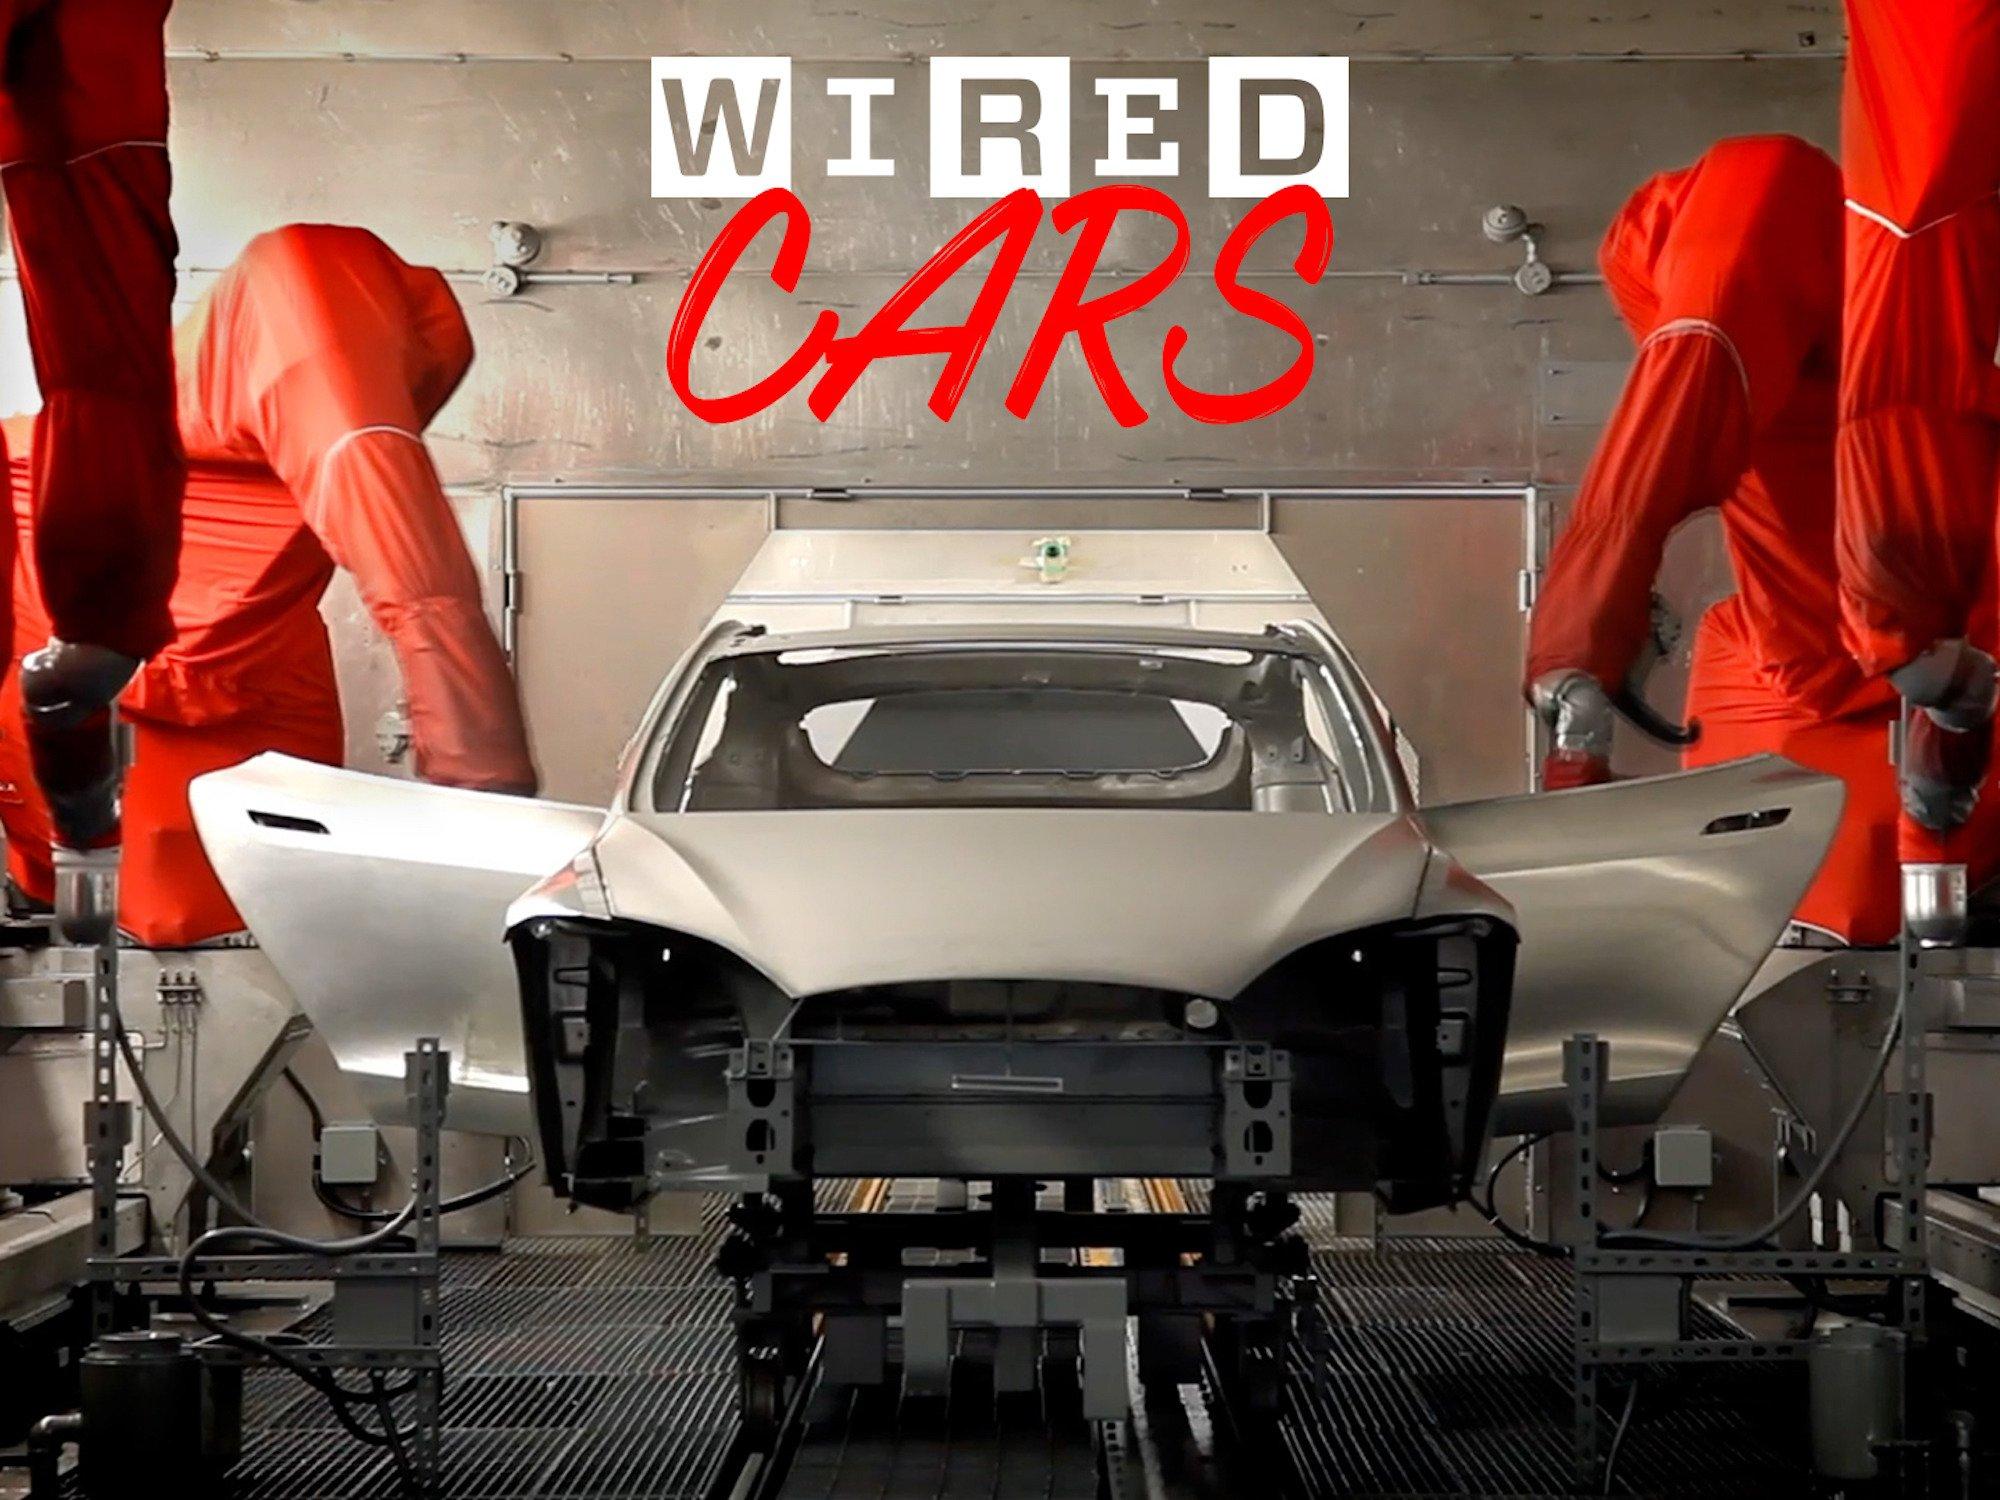 Clip: WIRED Cars - Season 1